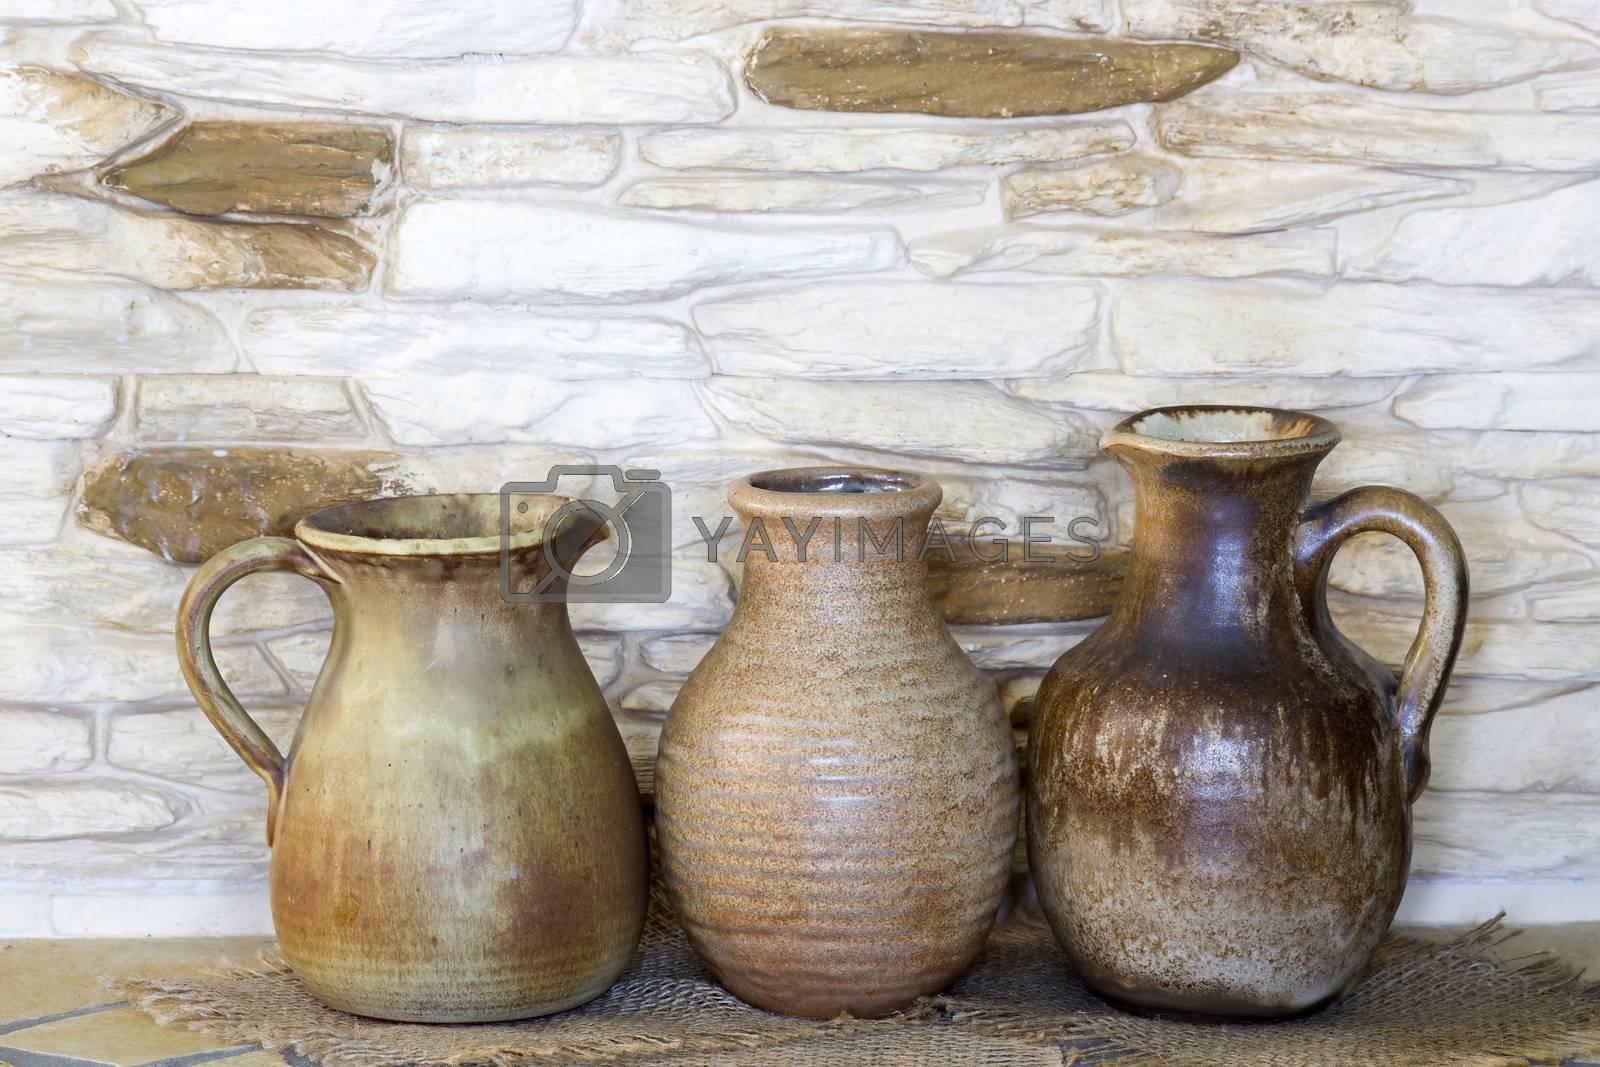 Clay jugs, old ceramic vases